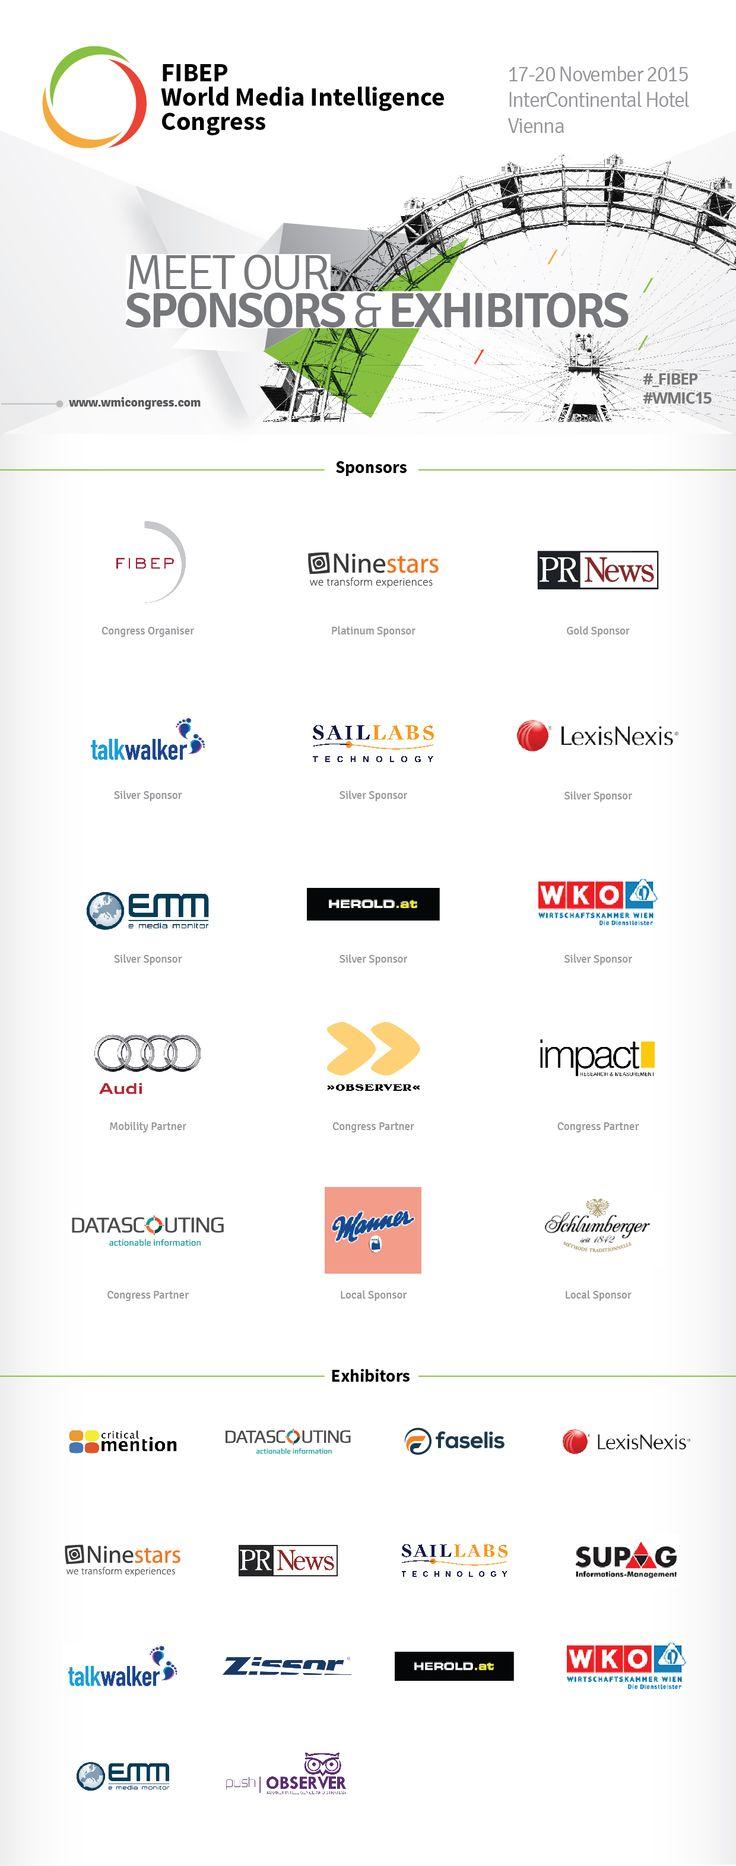 Meet #_FIBEP #WMIC15 #Vienna Sponsors, Exhibitors, Local Sponsors, Congress Partners.